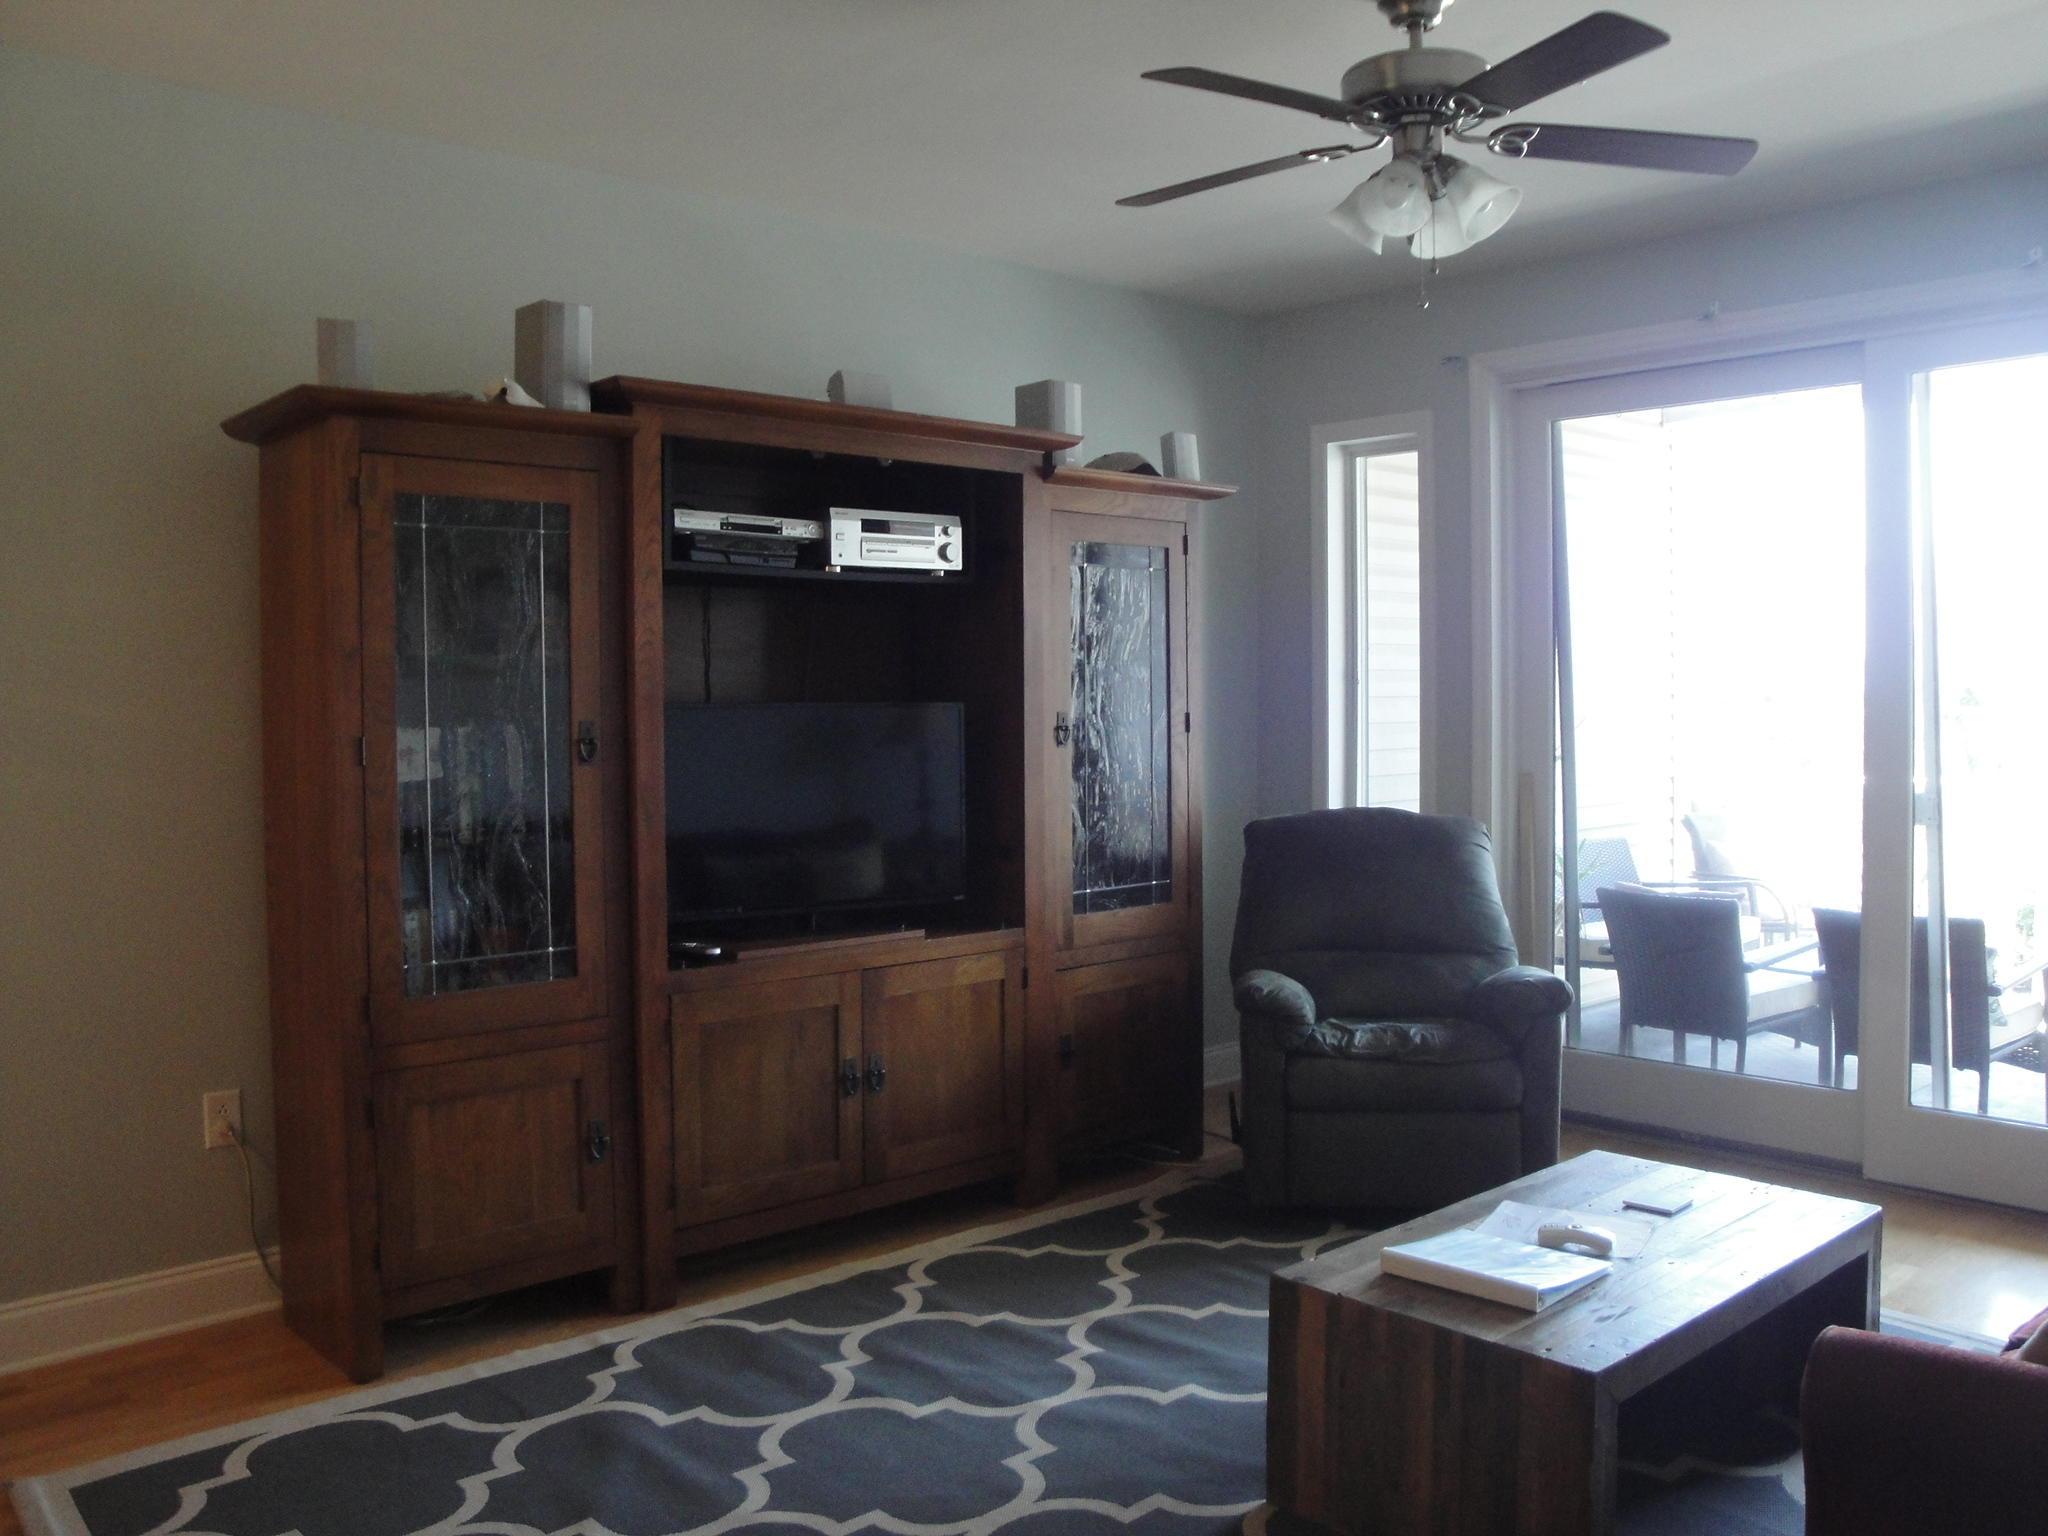 Pier Pointe Villas Homes For Sale - 117 Ashley, Folly Beach, SC - 15